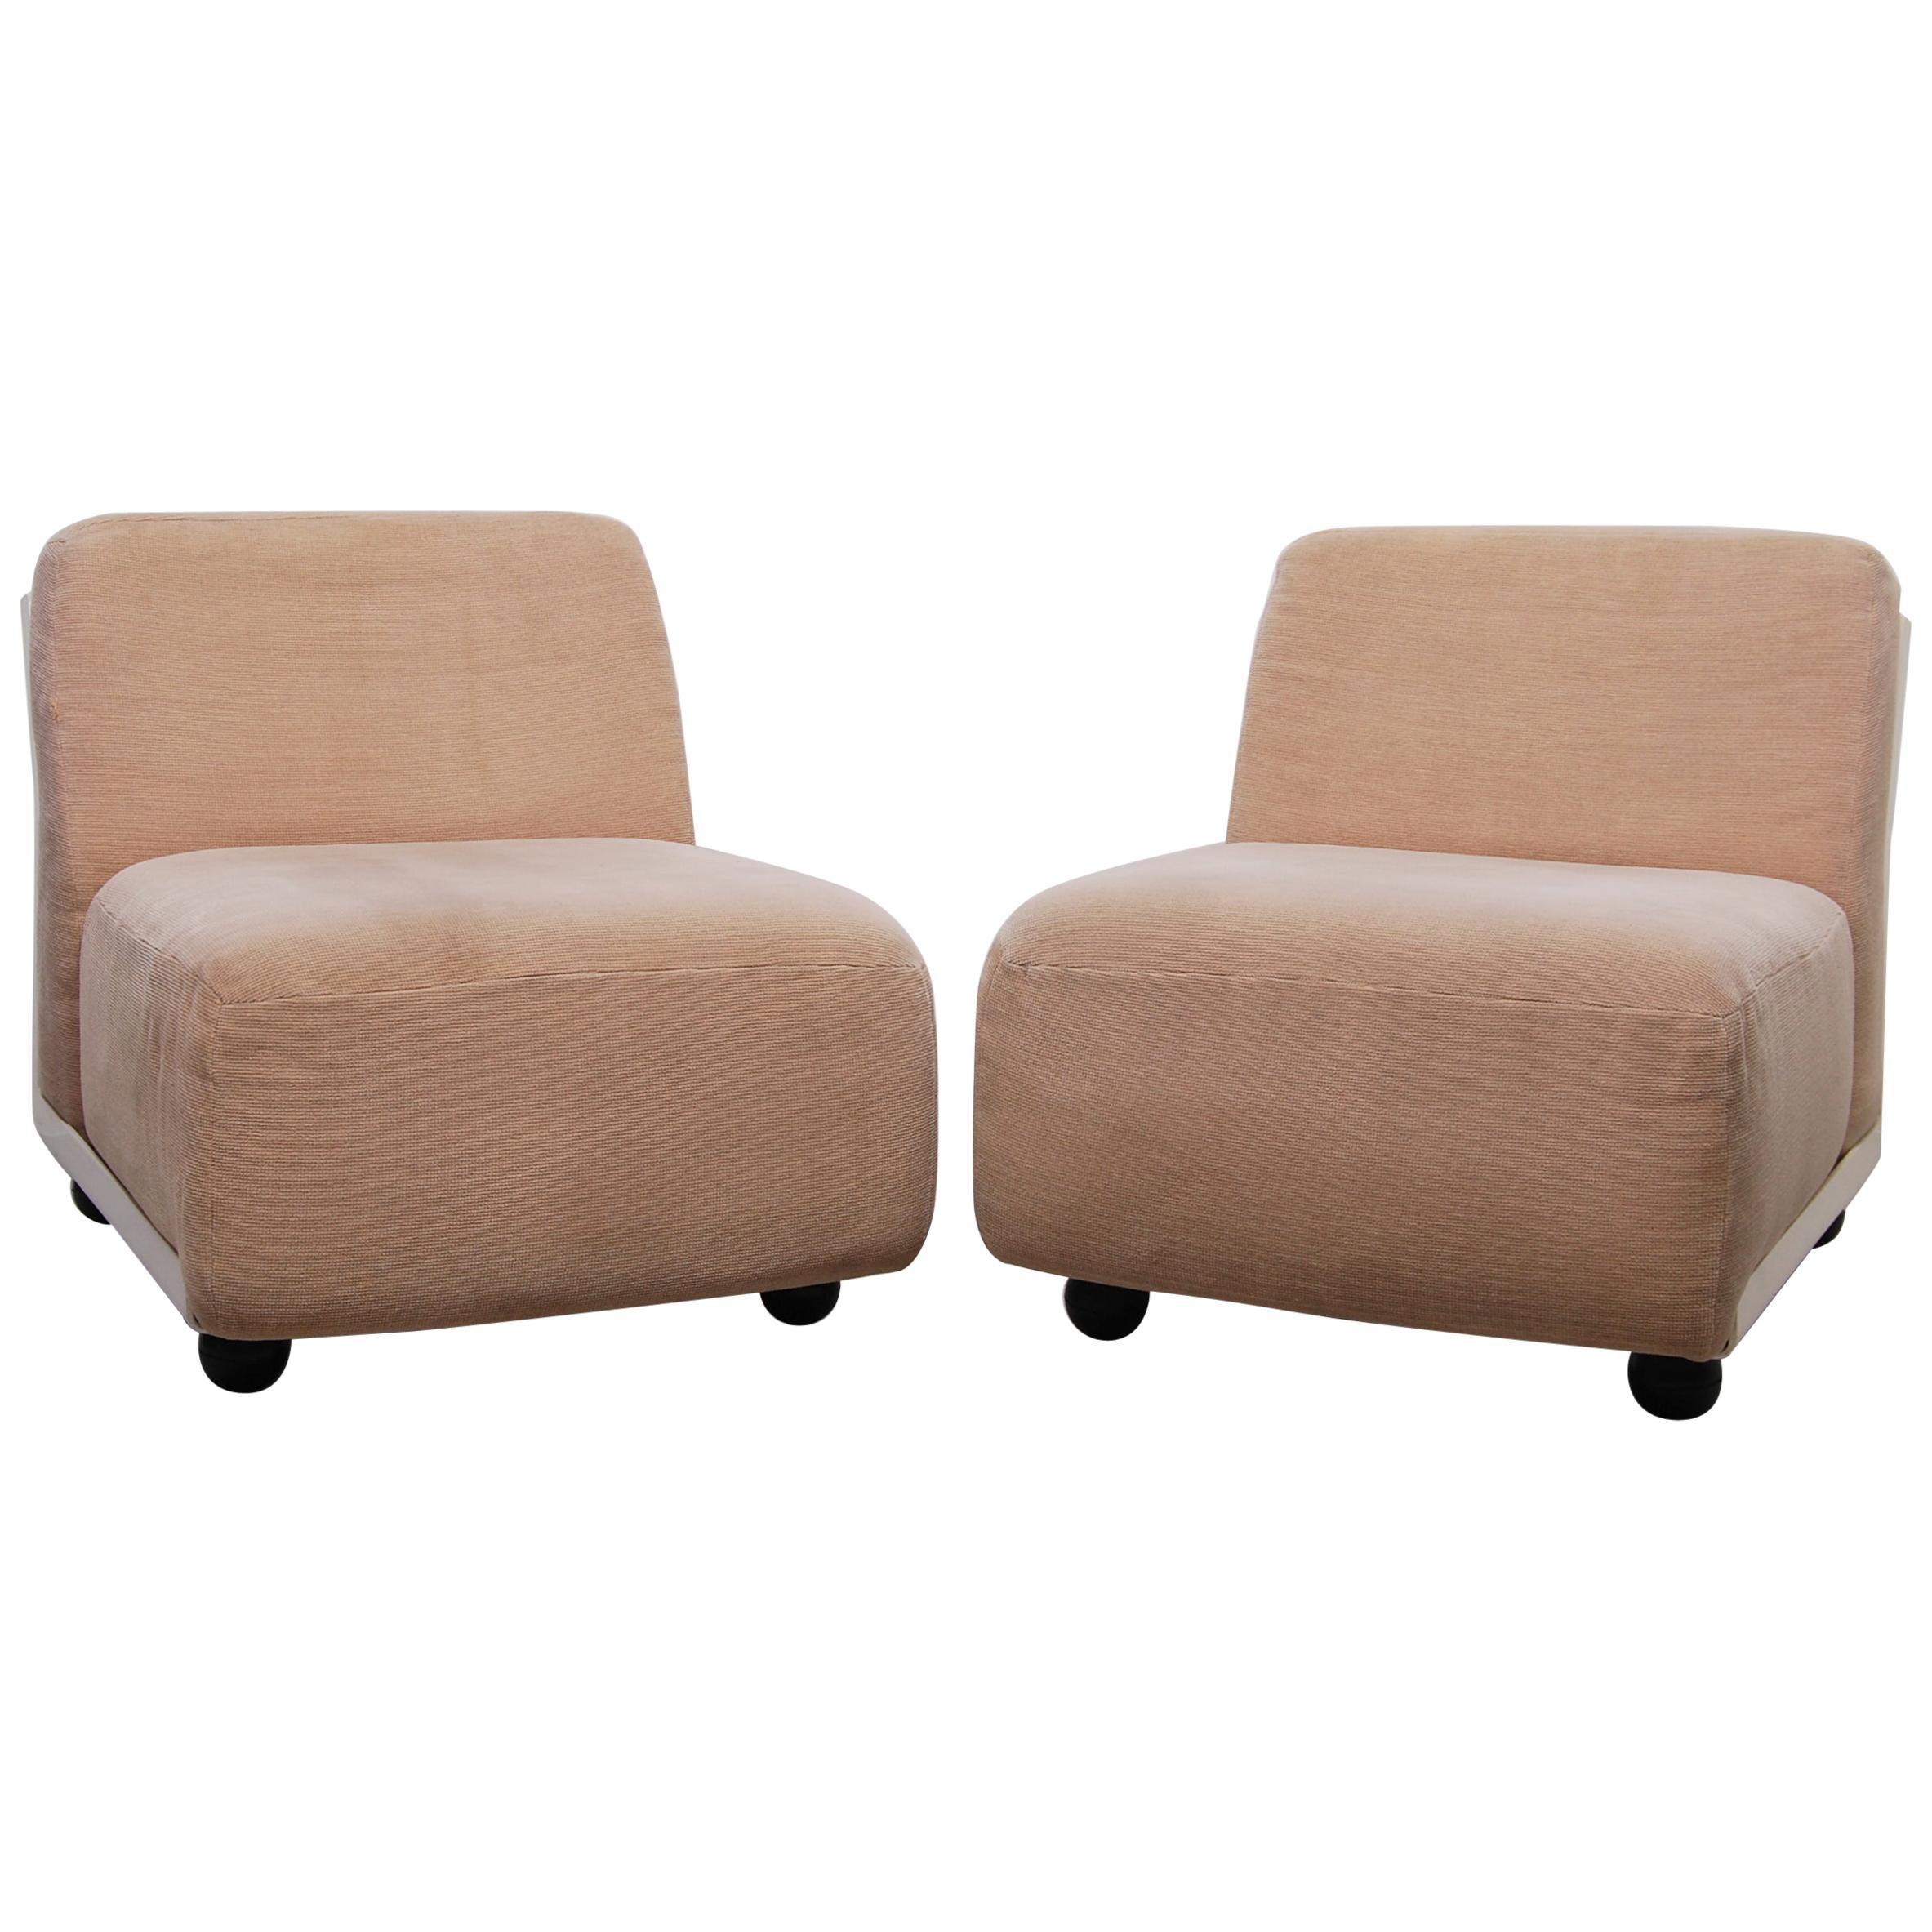 Italian Amanta 24 Chairs by Mario Bellini for B&B, 1970s